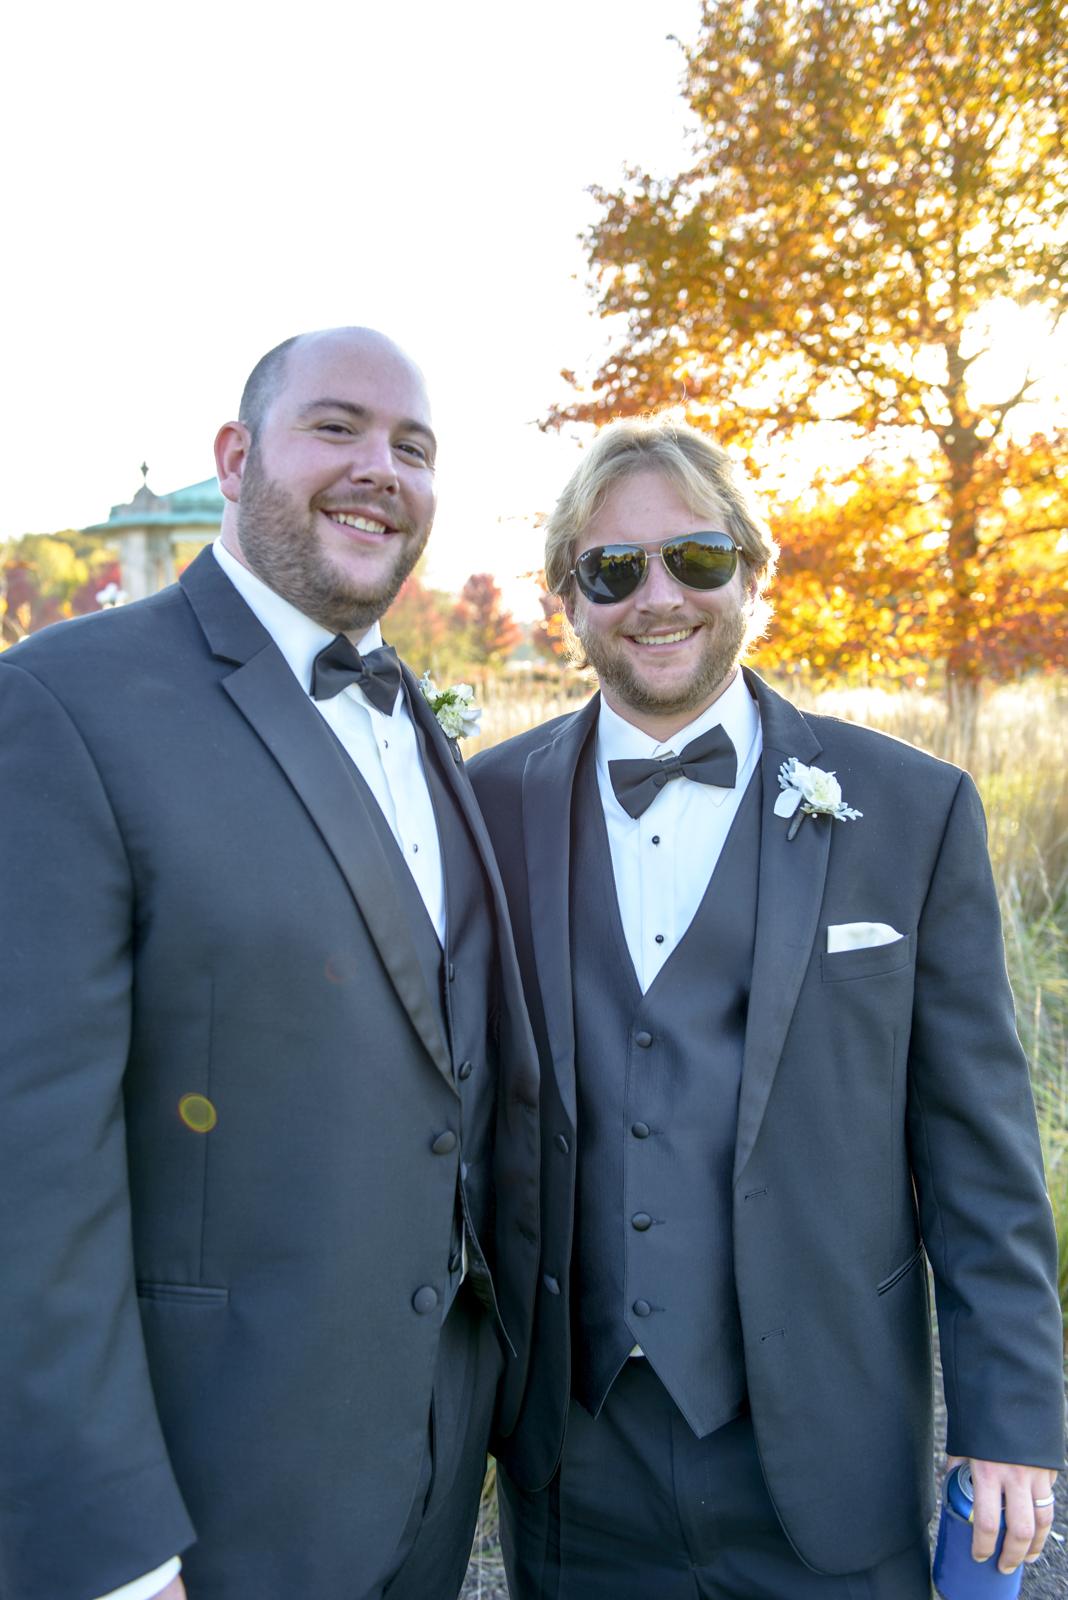 Our Wedding - Wester Wedding